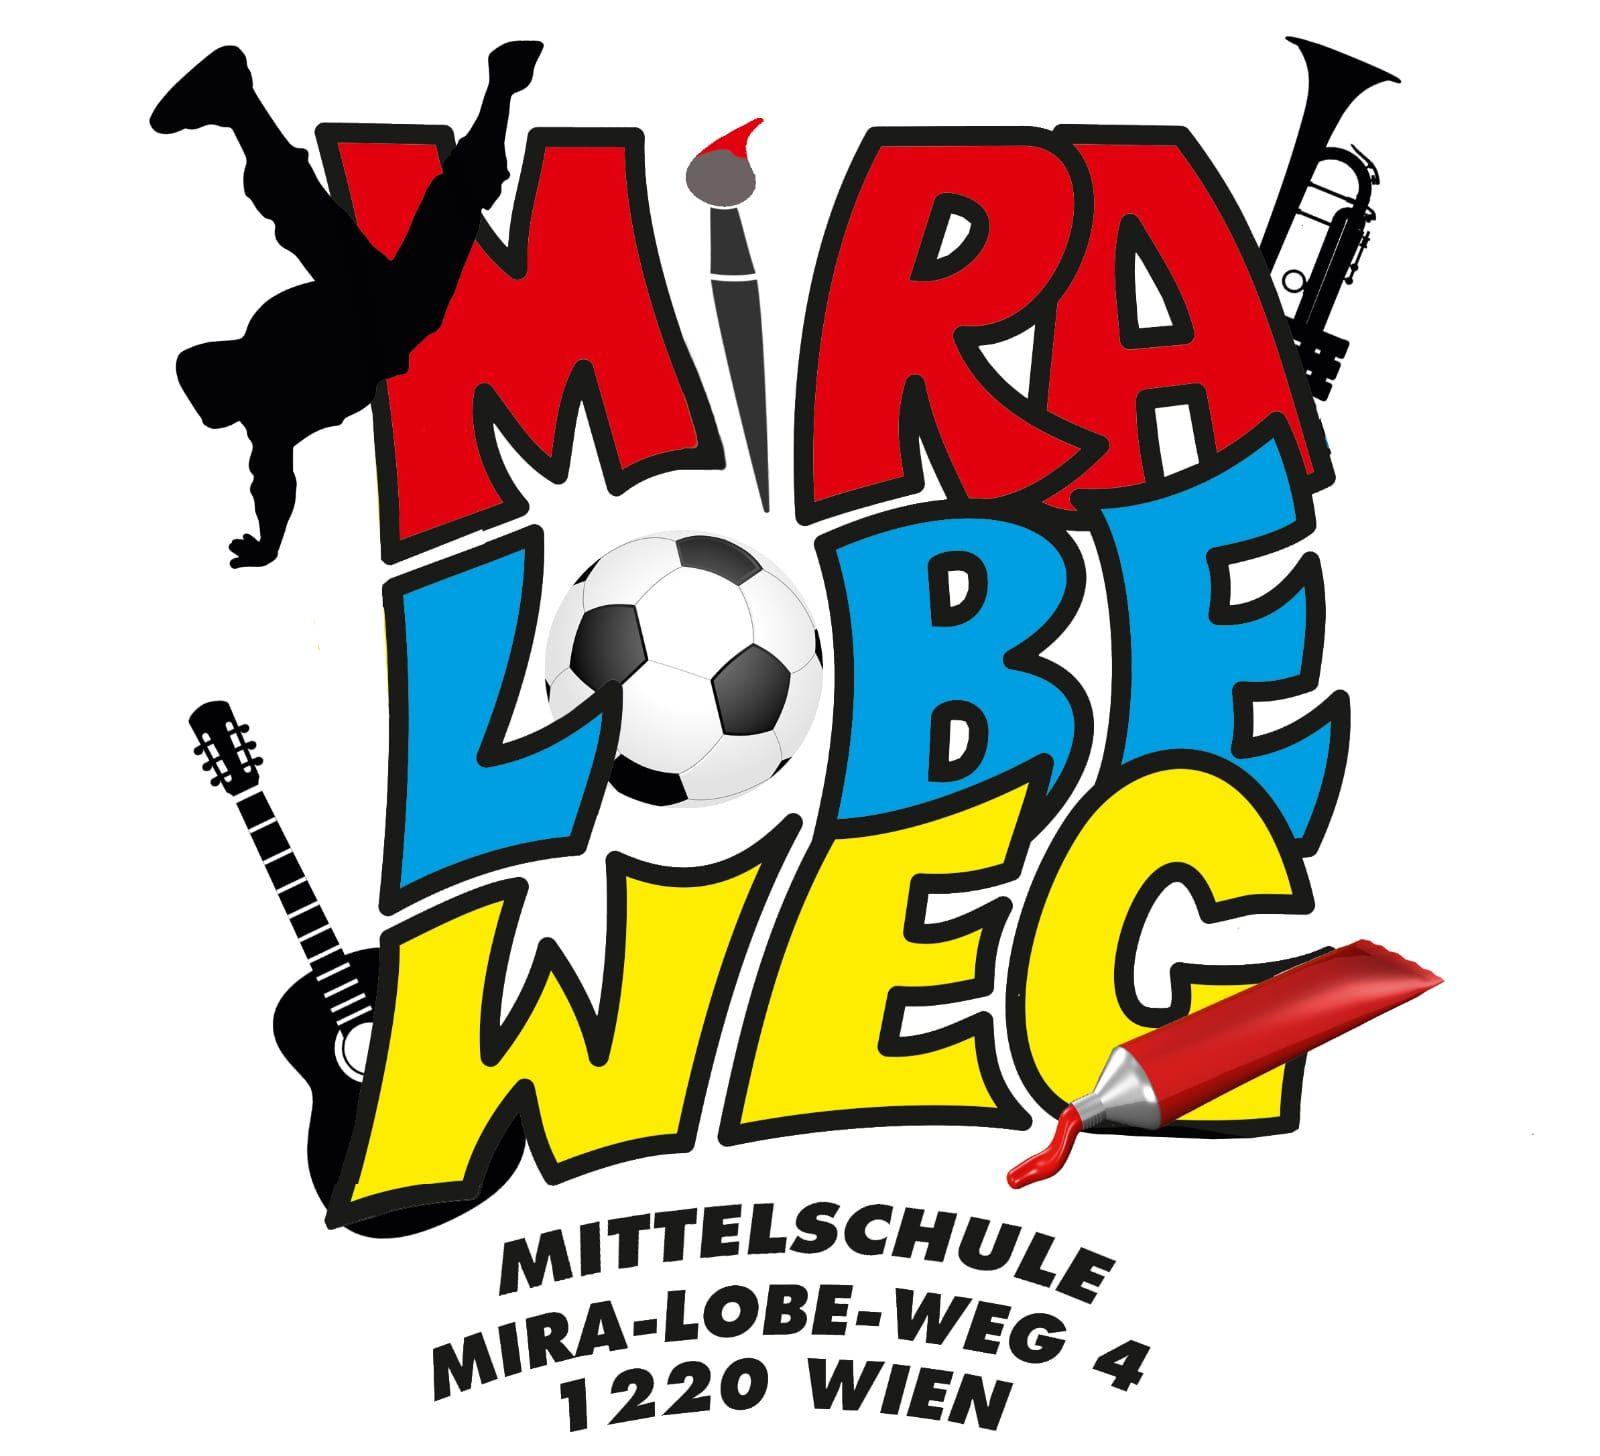 Mittelschule Mira Lobe Weg